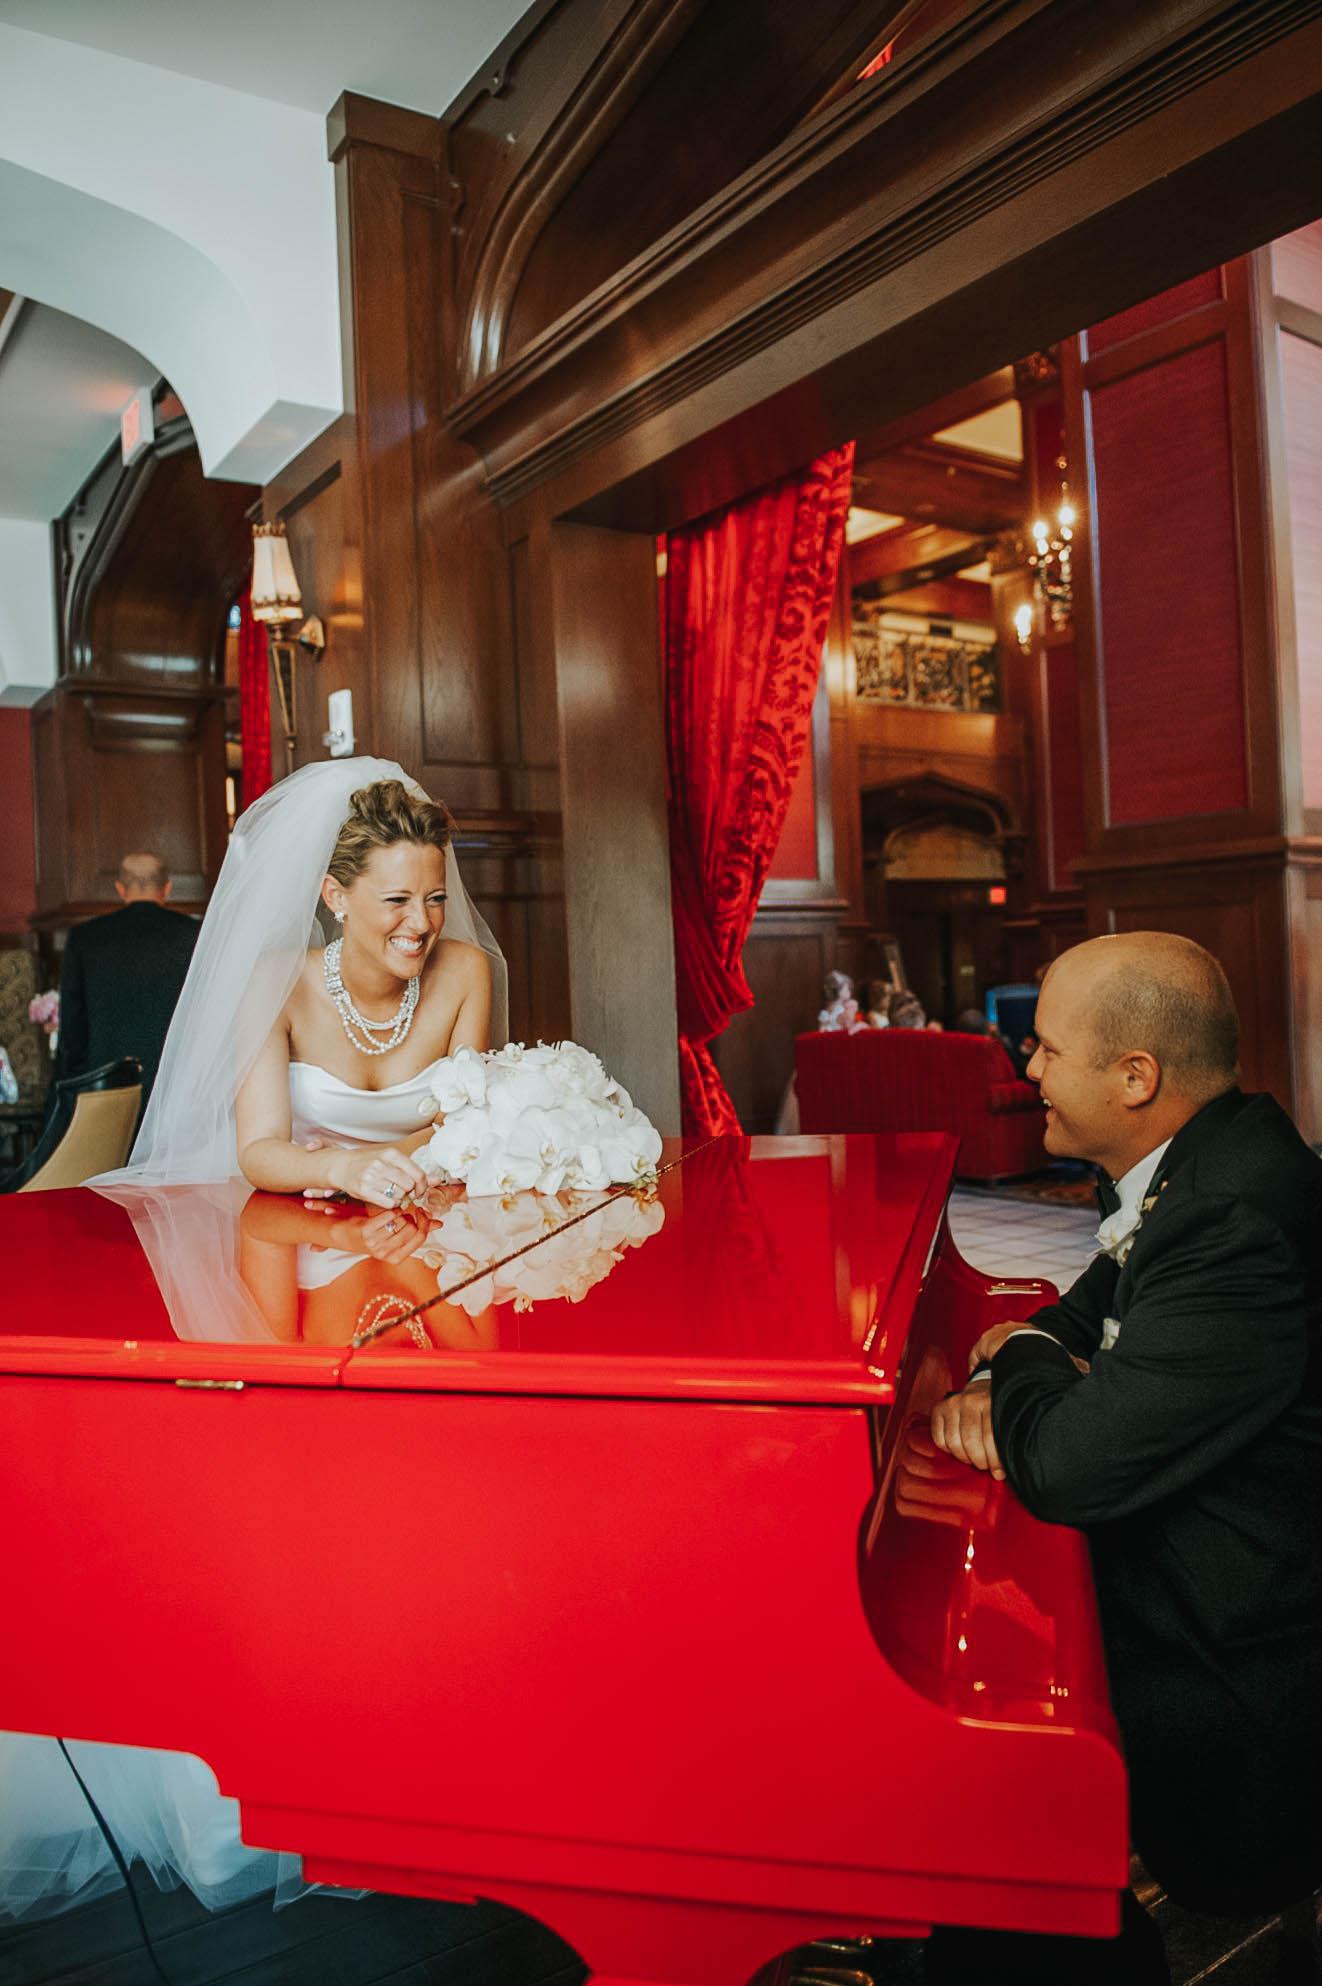 Whidbey-Island-Wedding-Photographer-J-Hodges (6 of 8).jpg